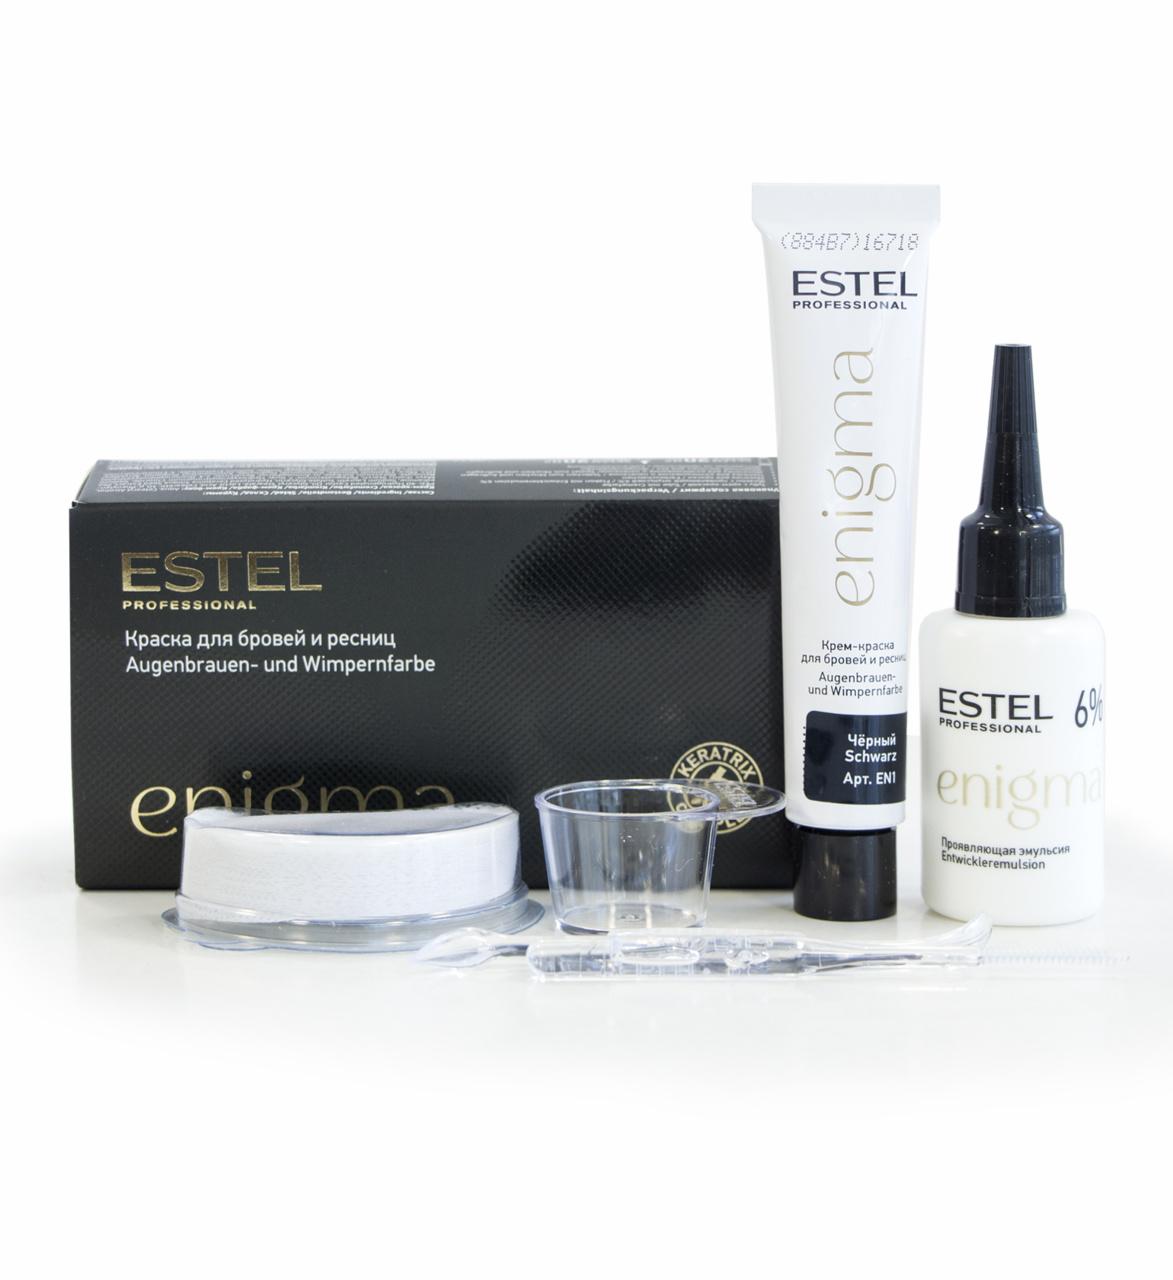 ENIGMA Vopsea pentru sprancene si gene - Negru, 20*20 ml